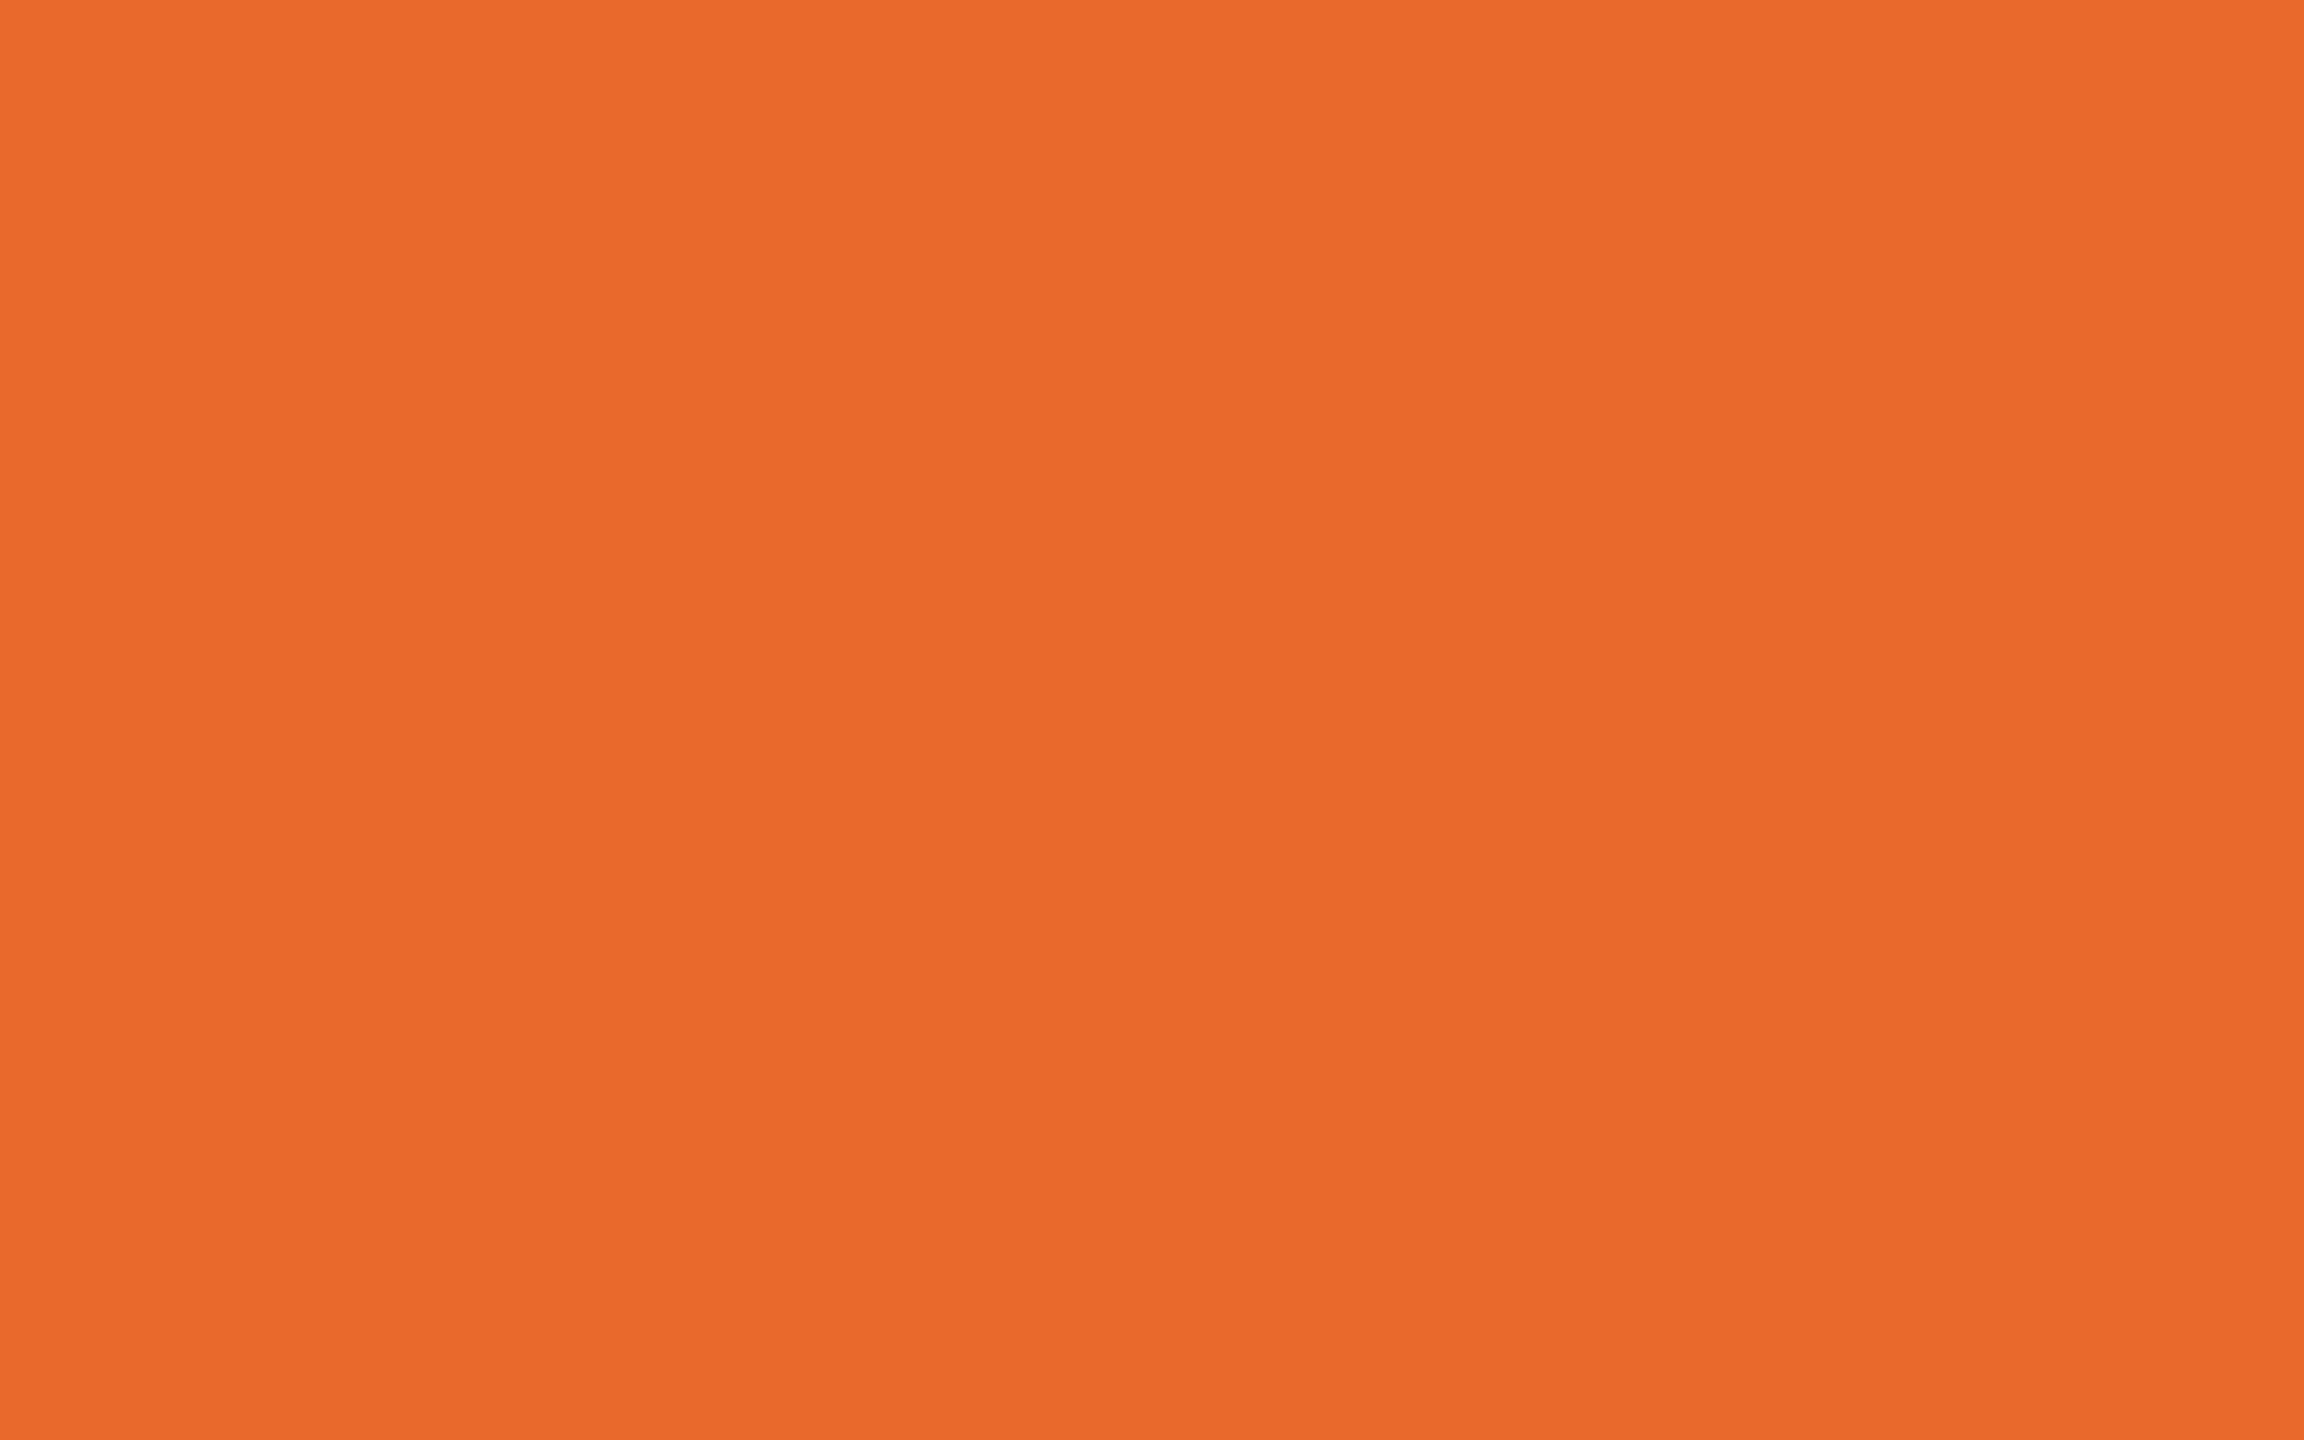 2304x1440 Deep Carrot Orange Solid Color Background